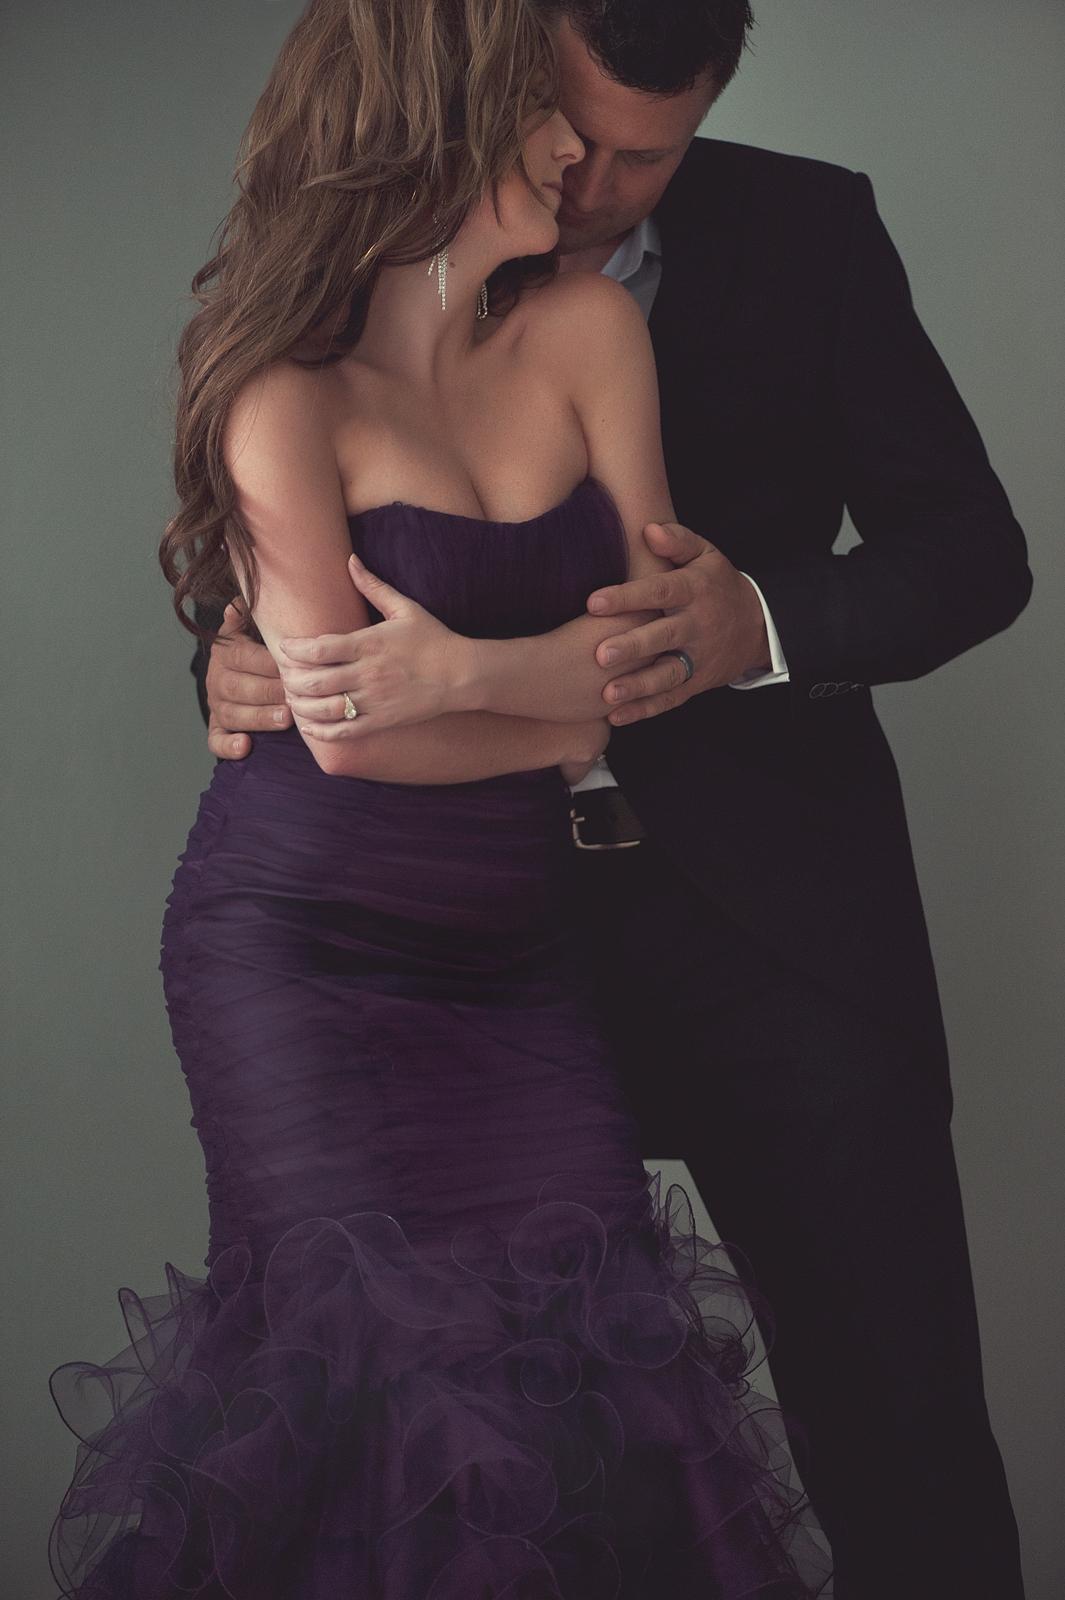 07-dramatic-fine-art-couple-dancing-mood.jpg